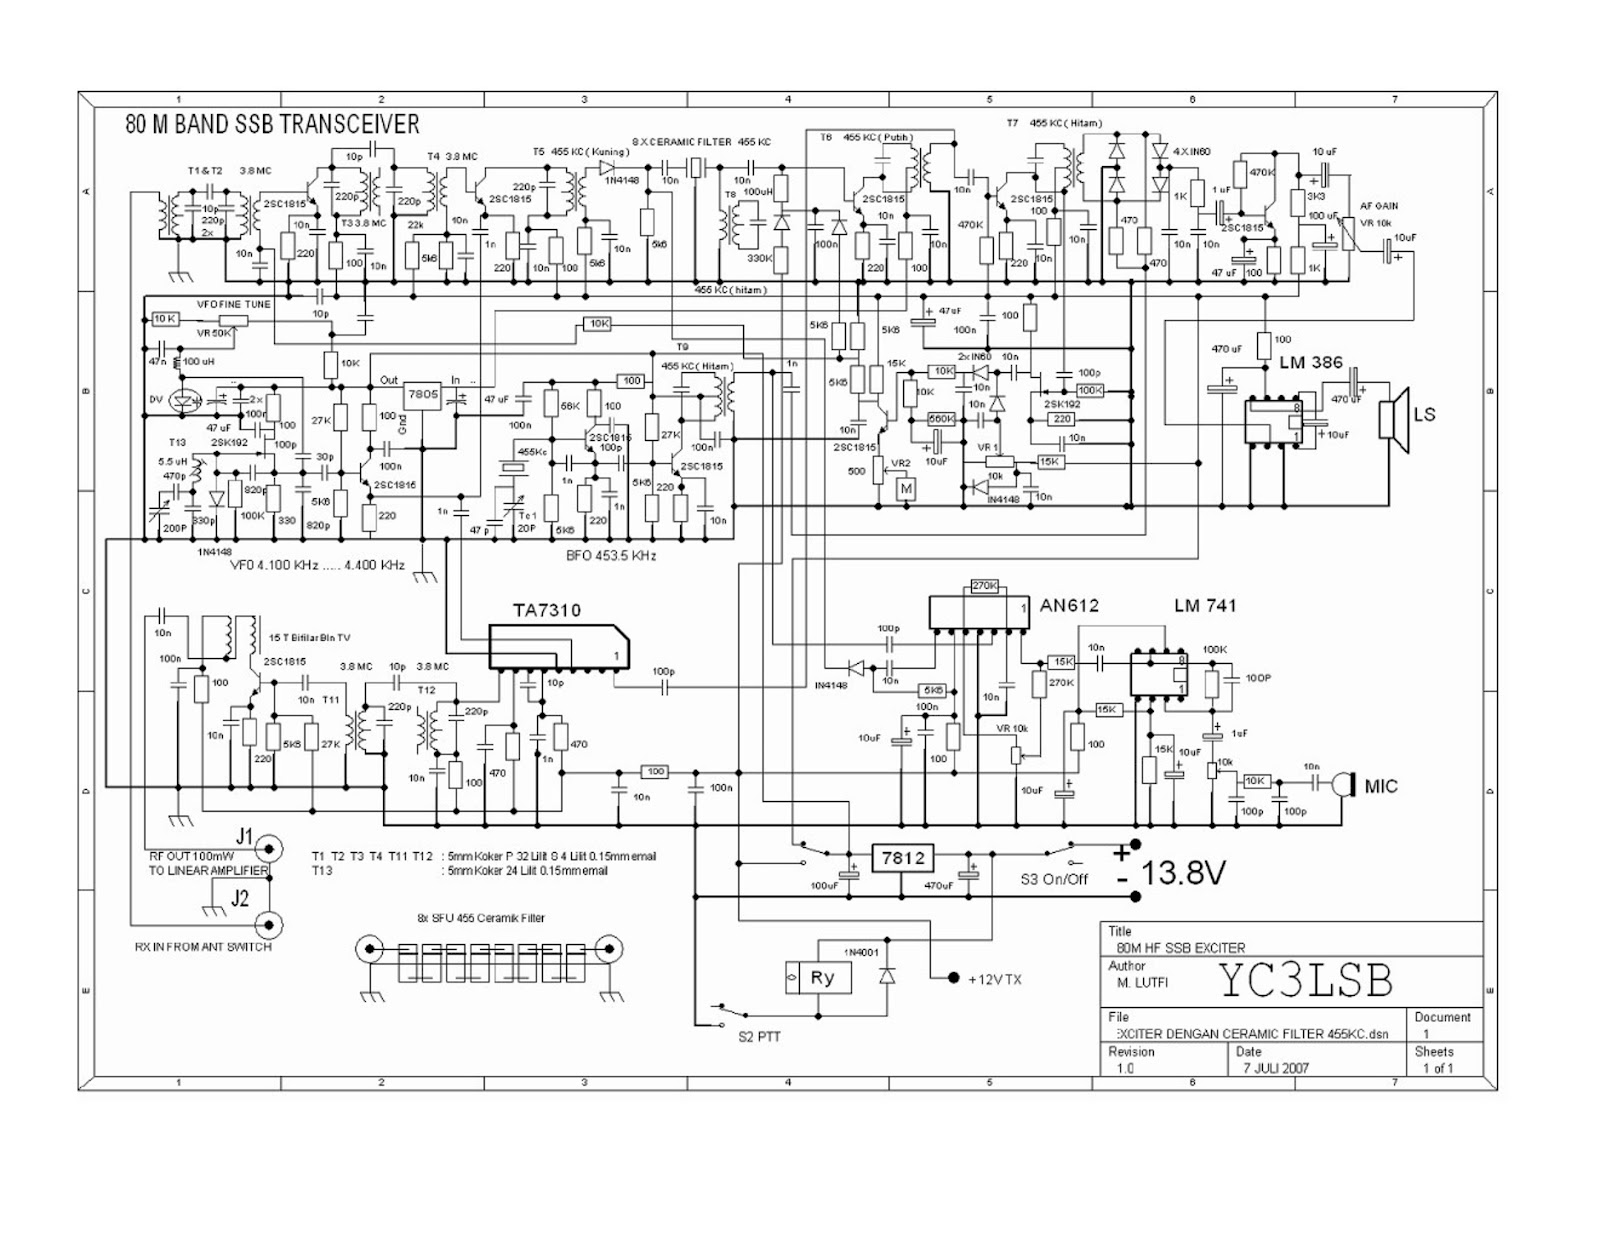 Radio Tengkorak Homebrew Qrp 80m Band Transceiver If 455 Kc